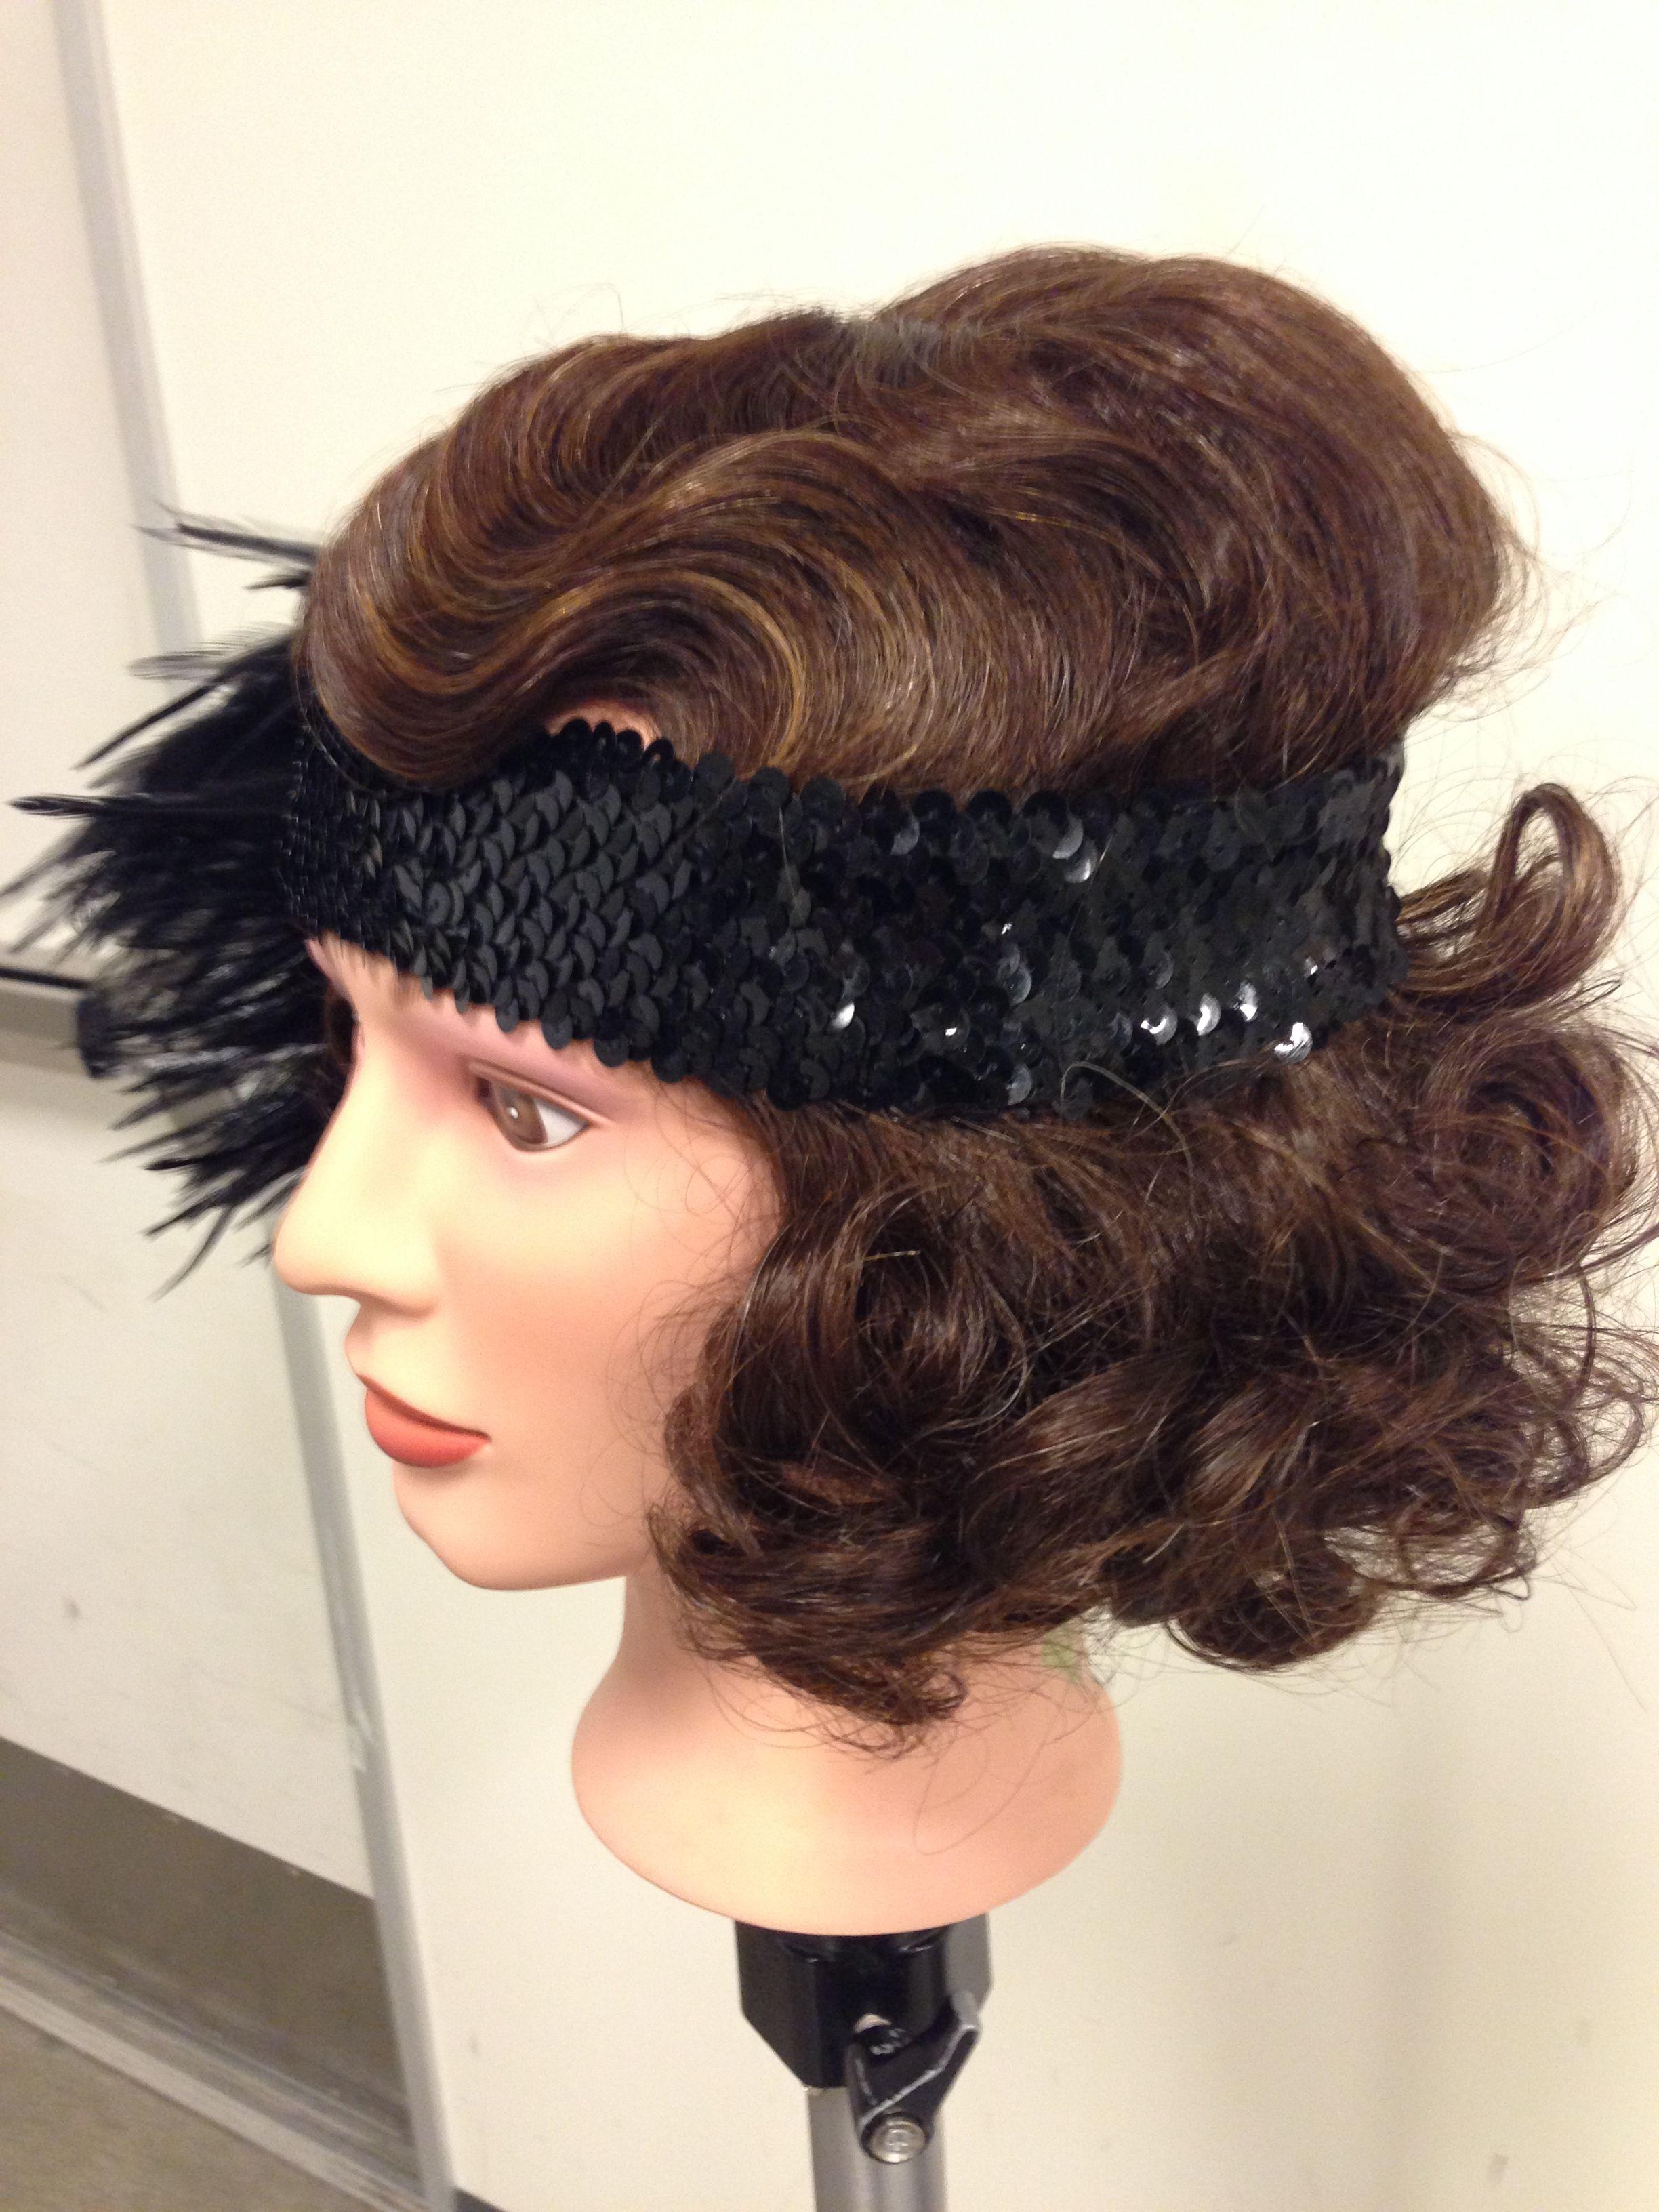 Strange Finger Waves And Pin Curls Laura Pfeifer Hair Work Portfolio Hairstyles For Men Maxibearus